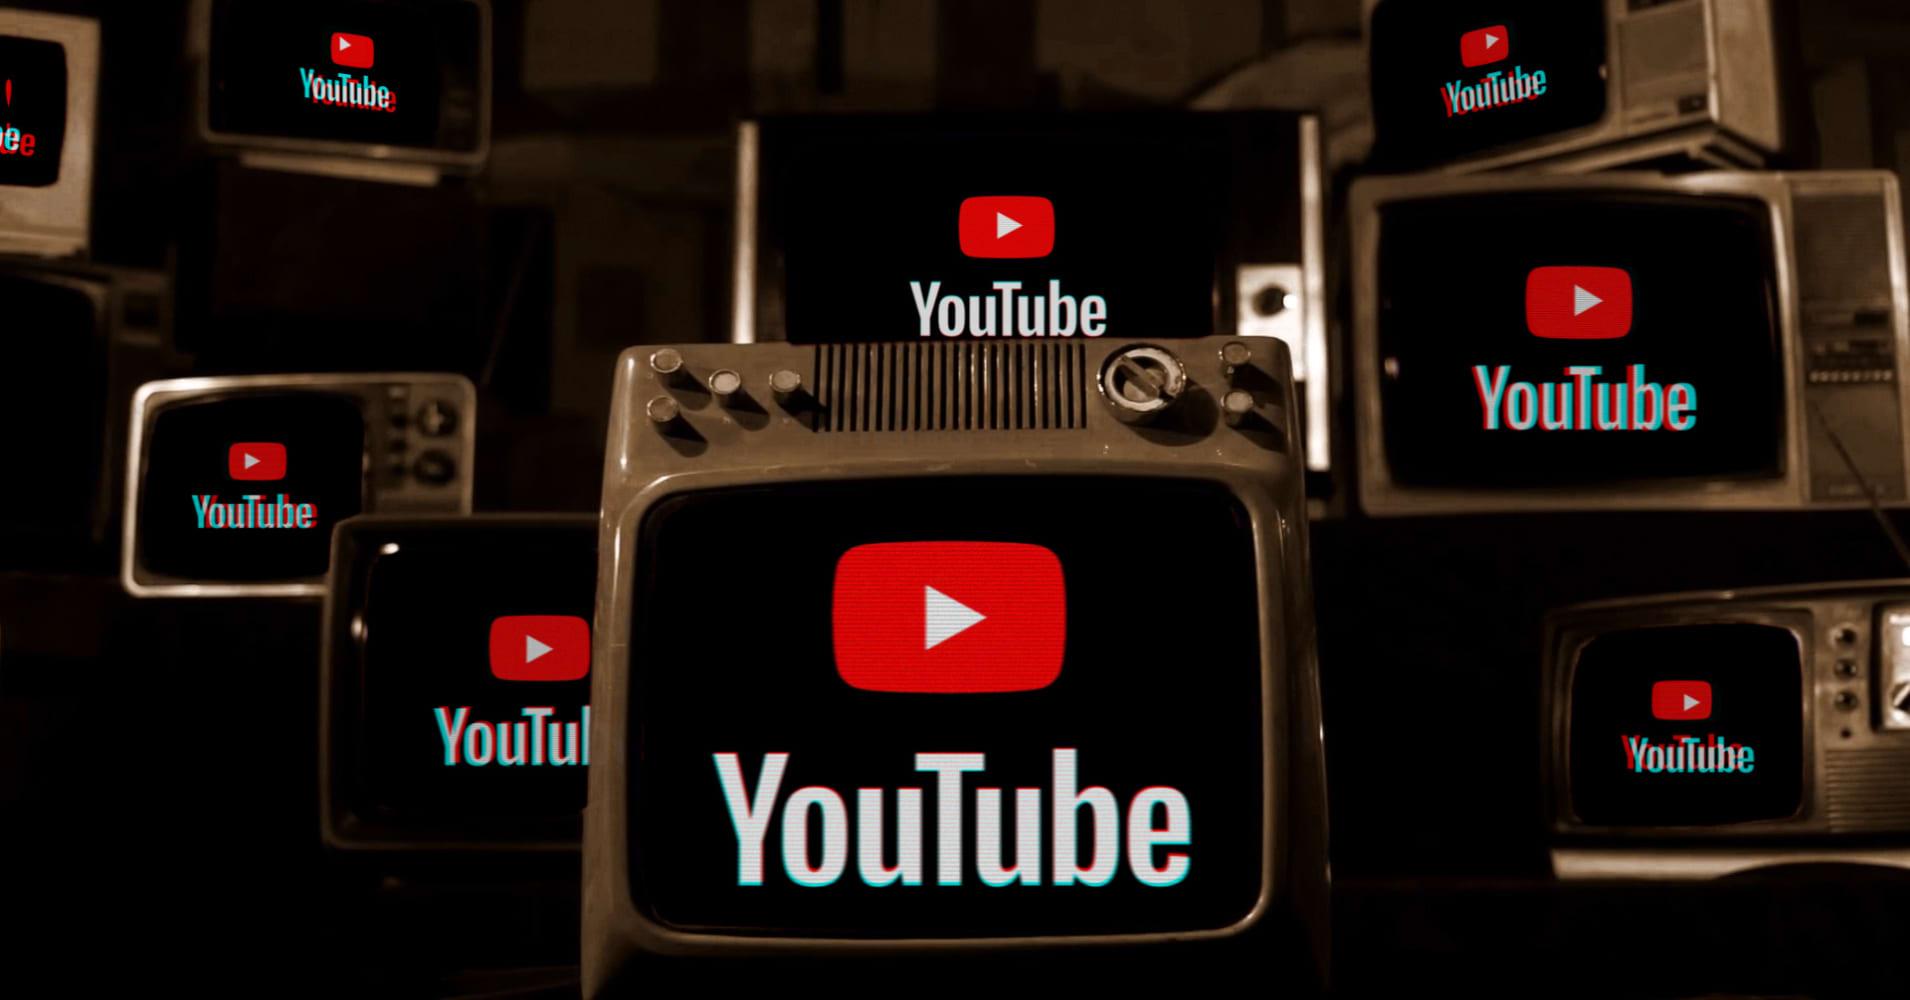 How Google's YouTube dominates internet video